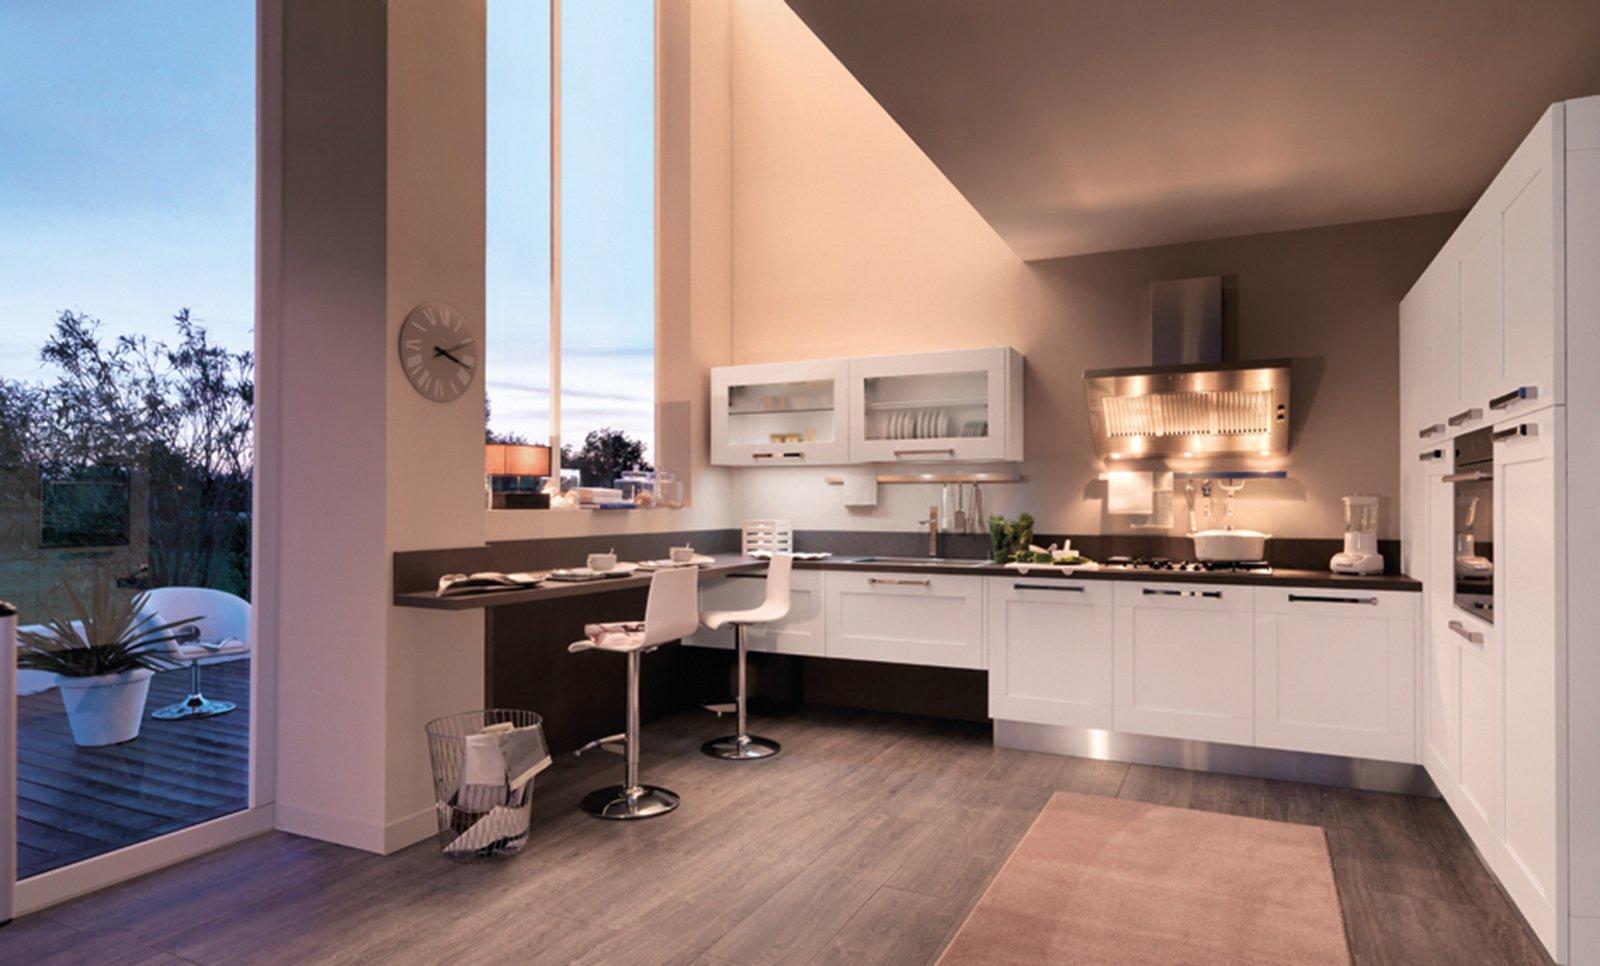 Cucina tante soluzioni per illuminarla cose di casa for Immagini per cucina